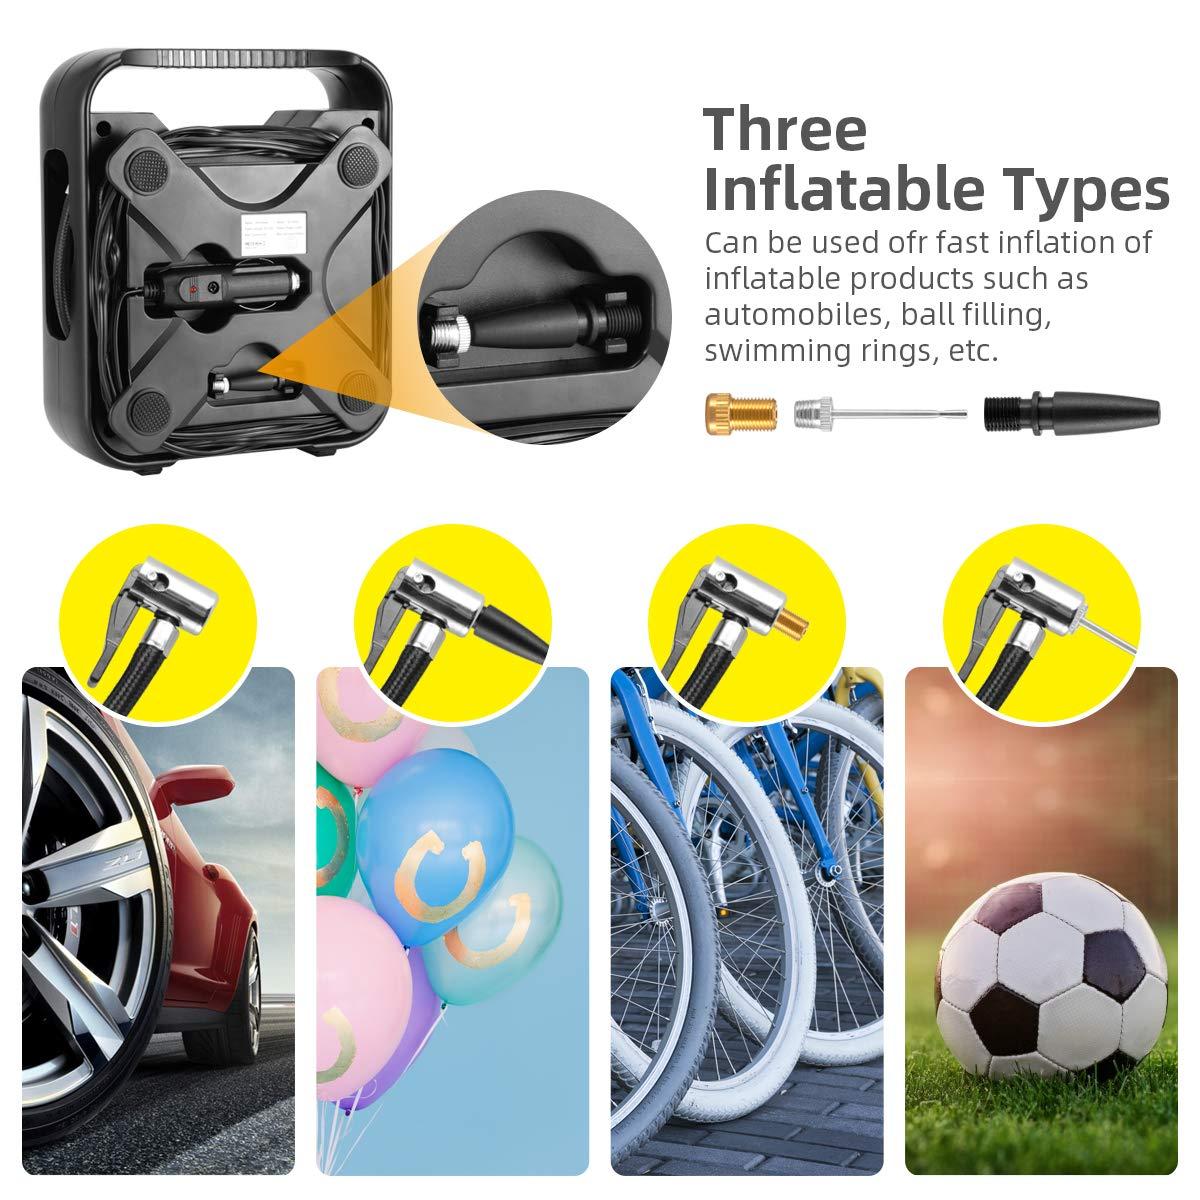 WindGallop Tyre Inflator Air Compressor Car Air Pump for Car and Bike Tyre Pump DC 12V Preset Digital Tyre Pressure Gauge Valve Adaptors LED Light LCD Screen for Motorbike Football Inflatable